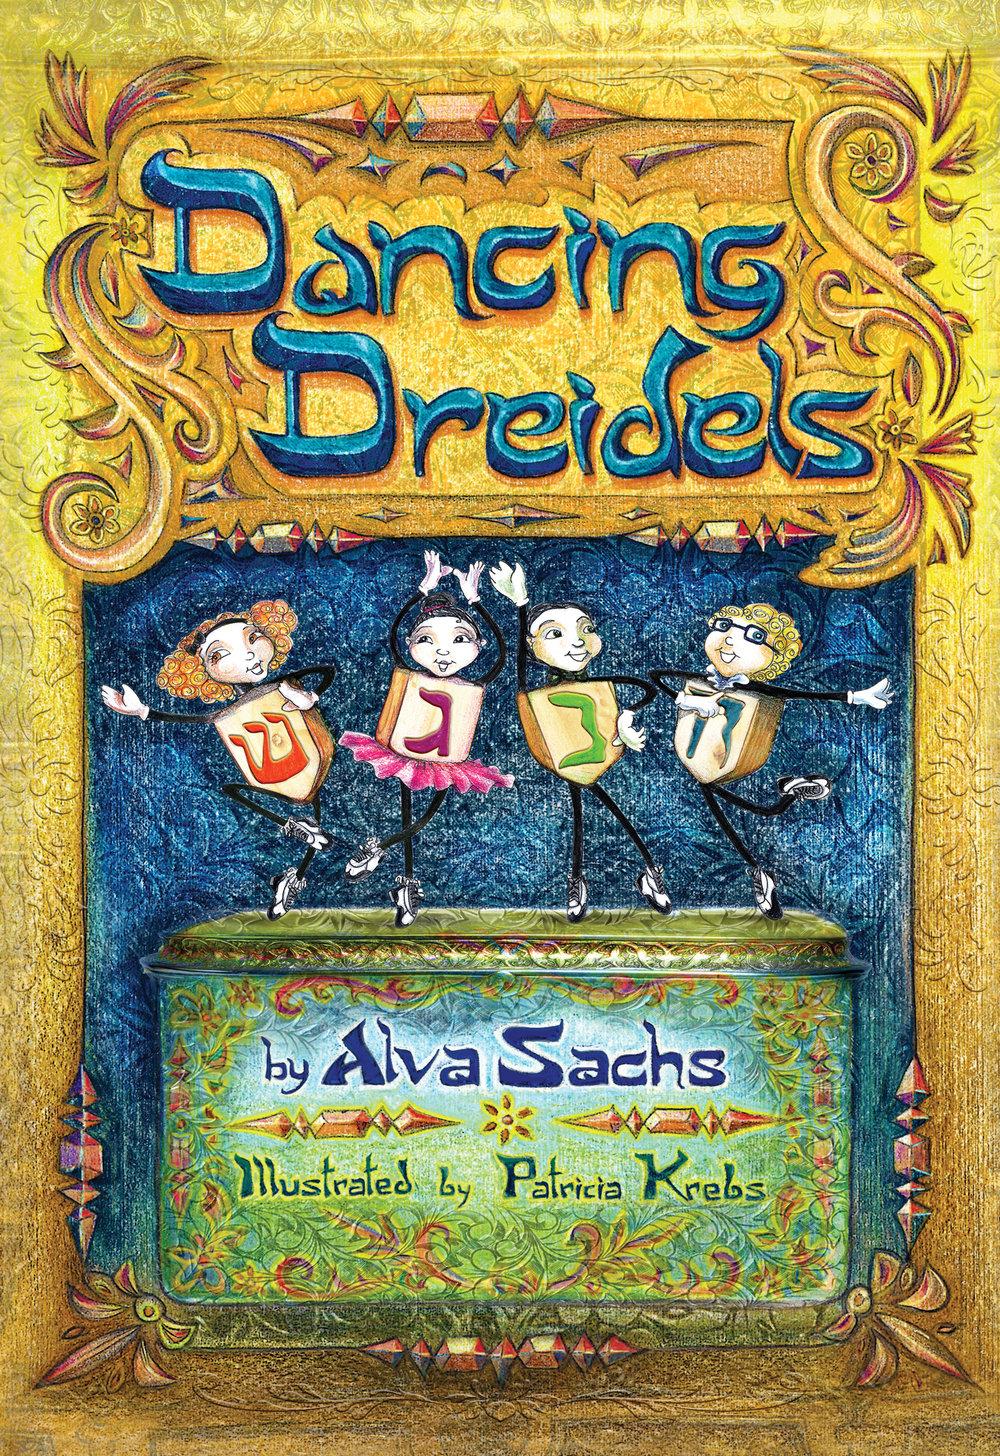 Dancing Dreidels FRONT-cover-HighRes.jpg